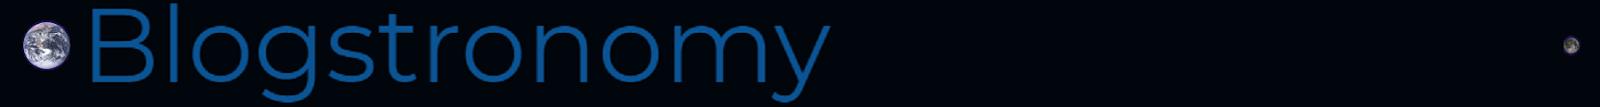 Blogstronomy